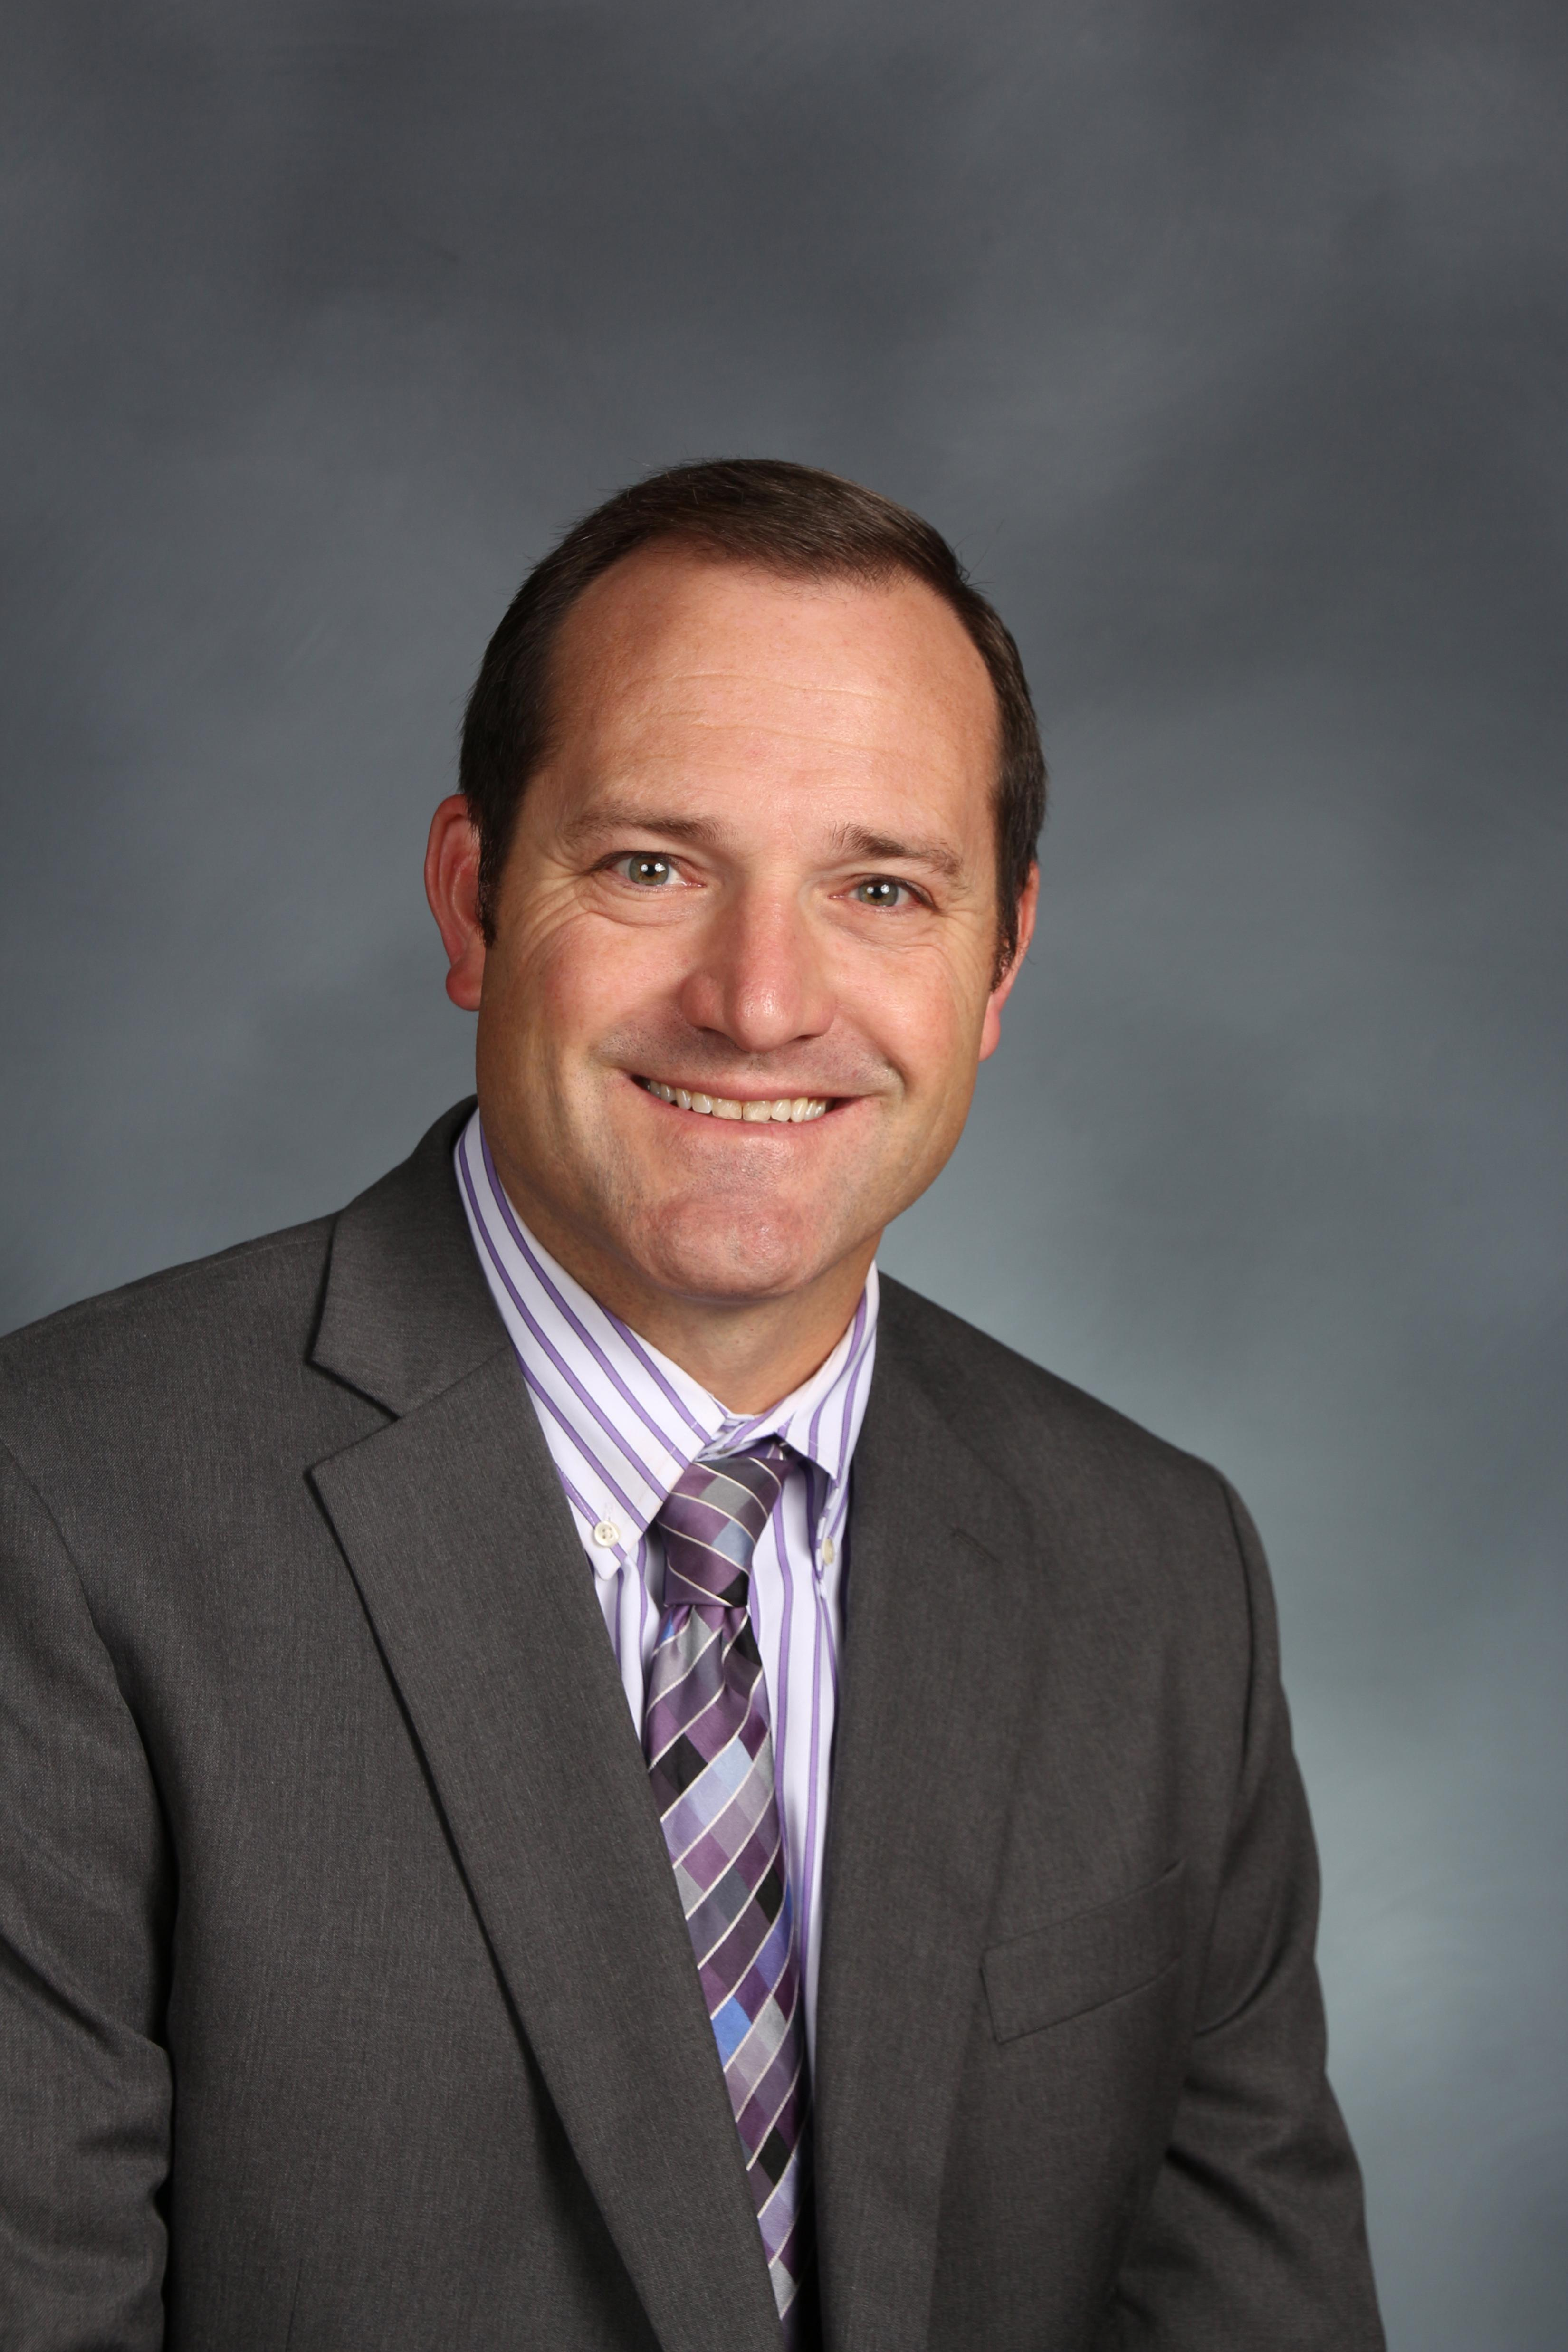 Dr. Brian Prybil, Asst. Superintendent for Elementary Teaching & Learning